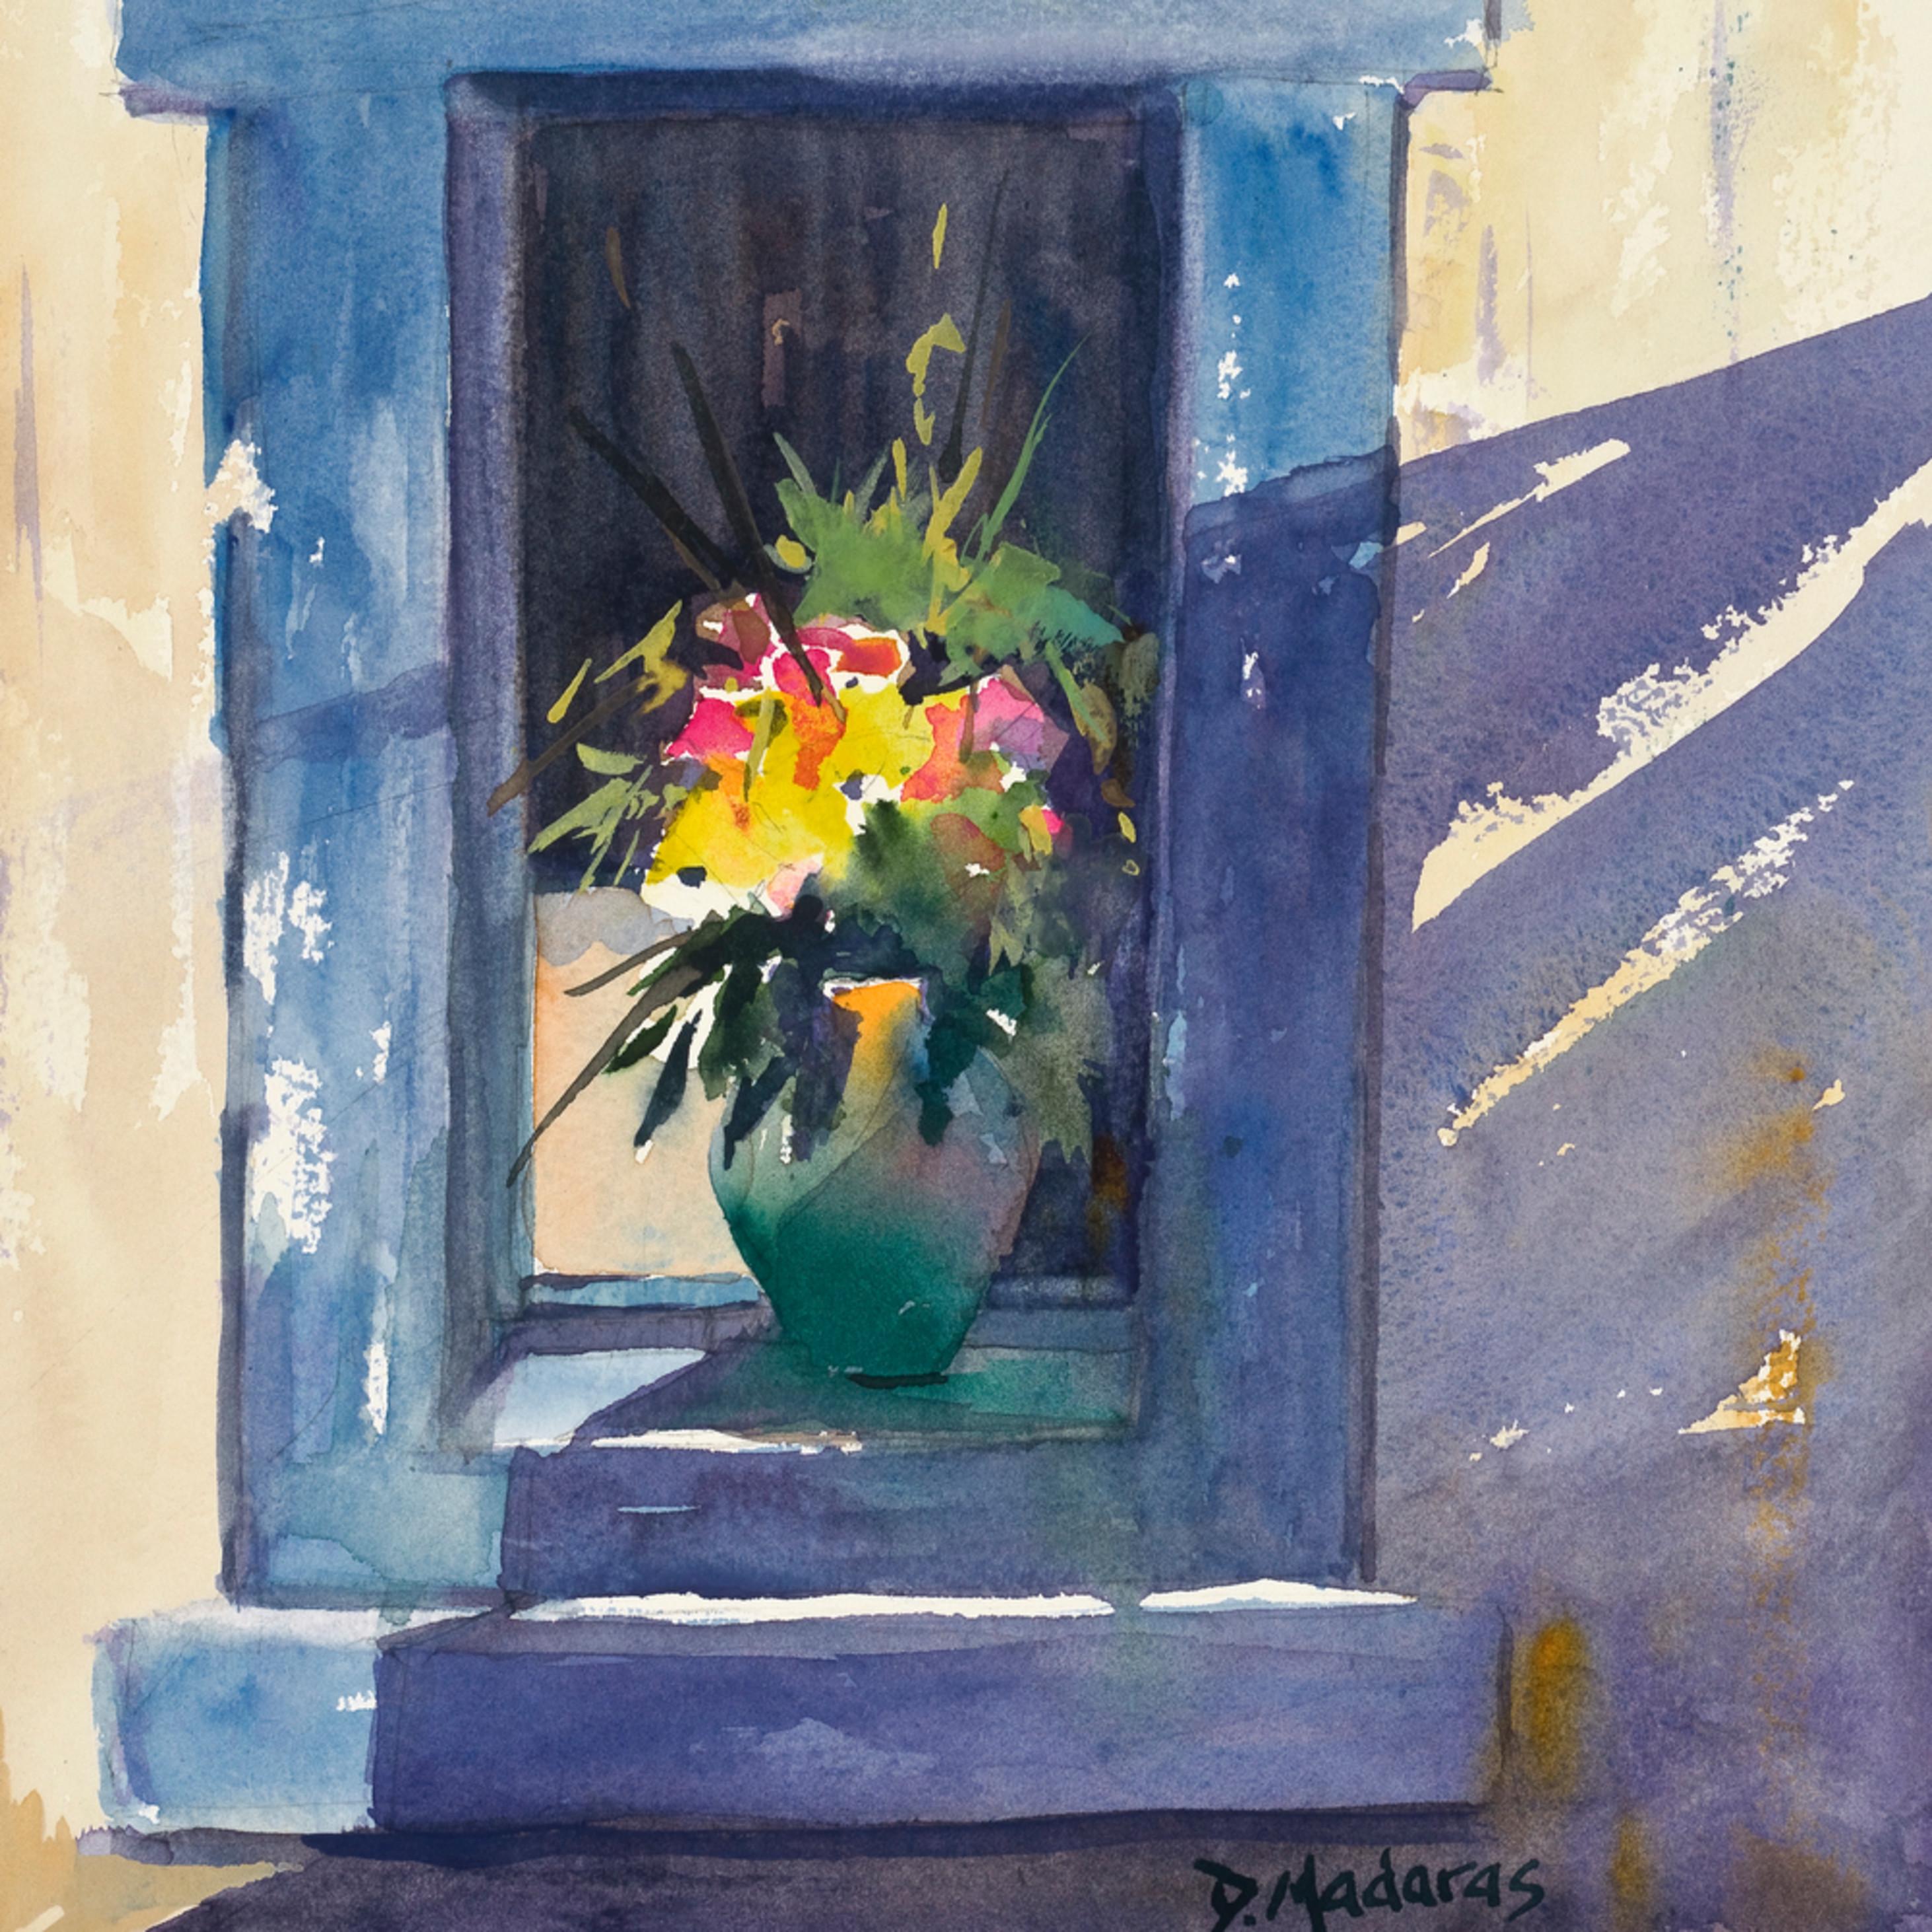 Pot in the blue window xxg hbdewi